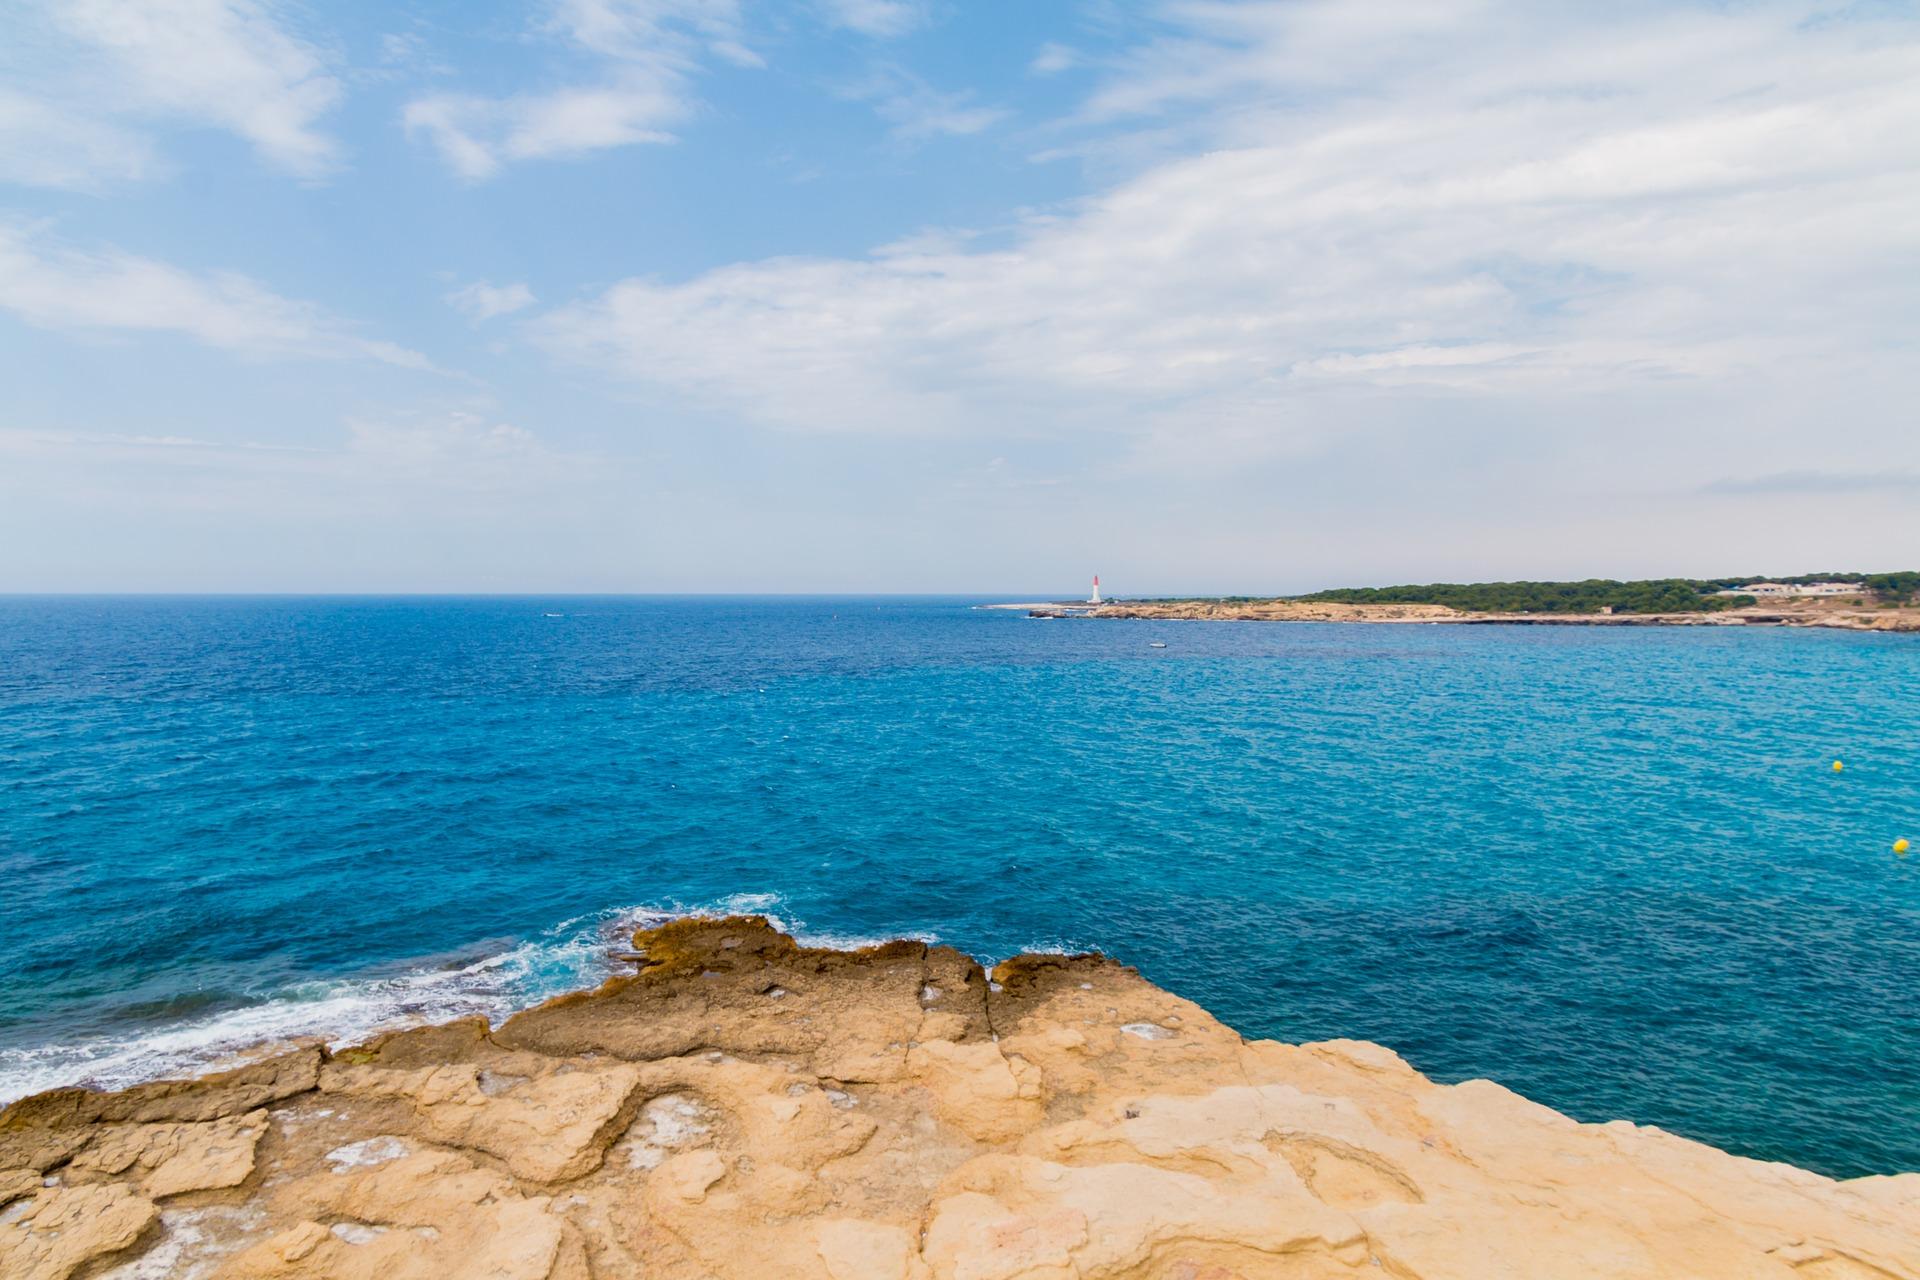 Vacances d'été : Hérault ou Gard ?